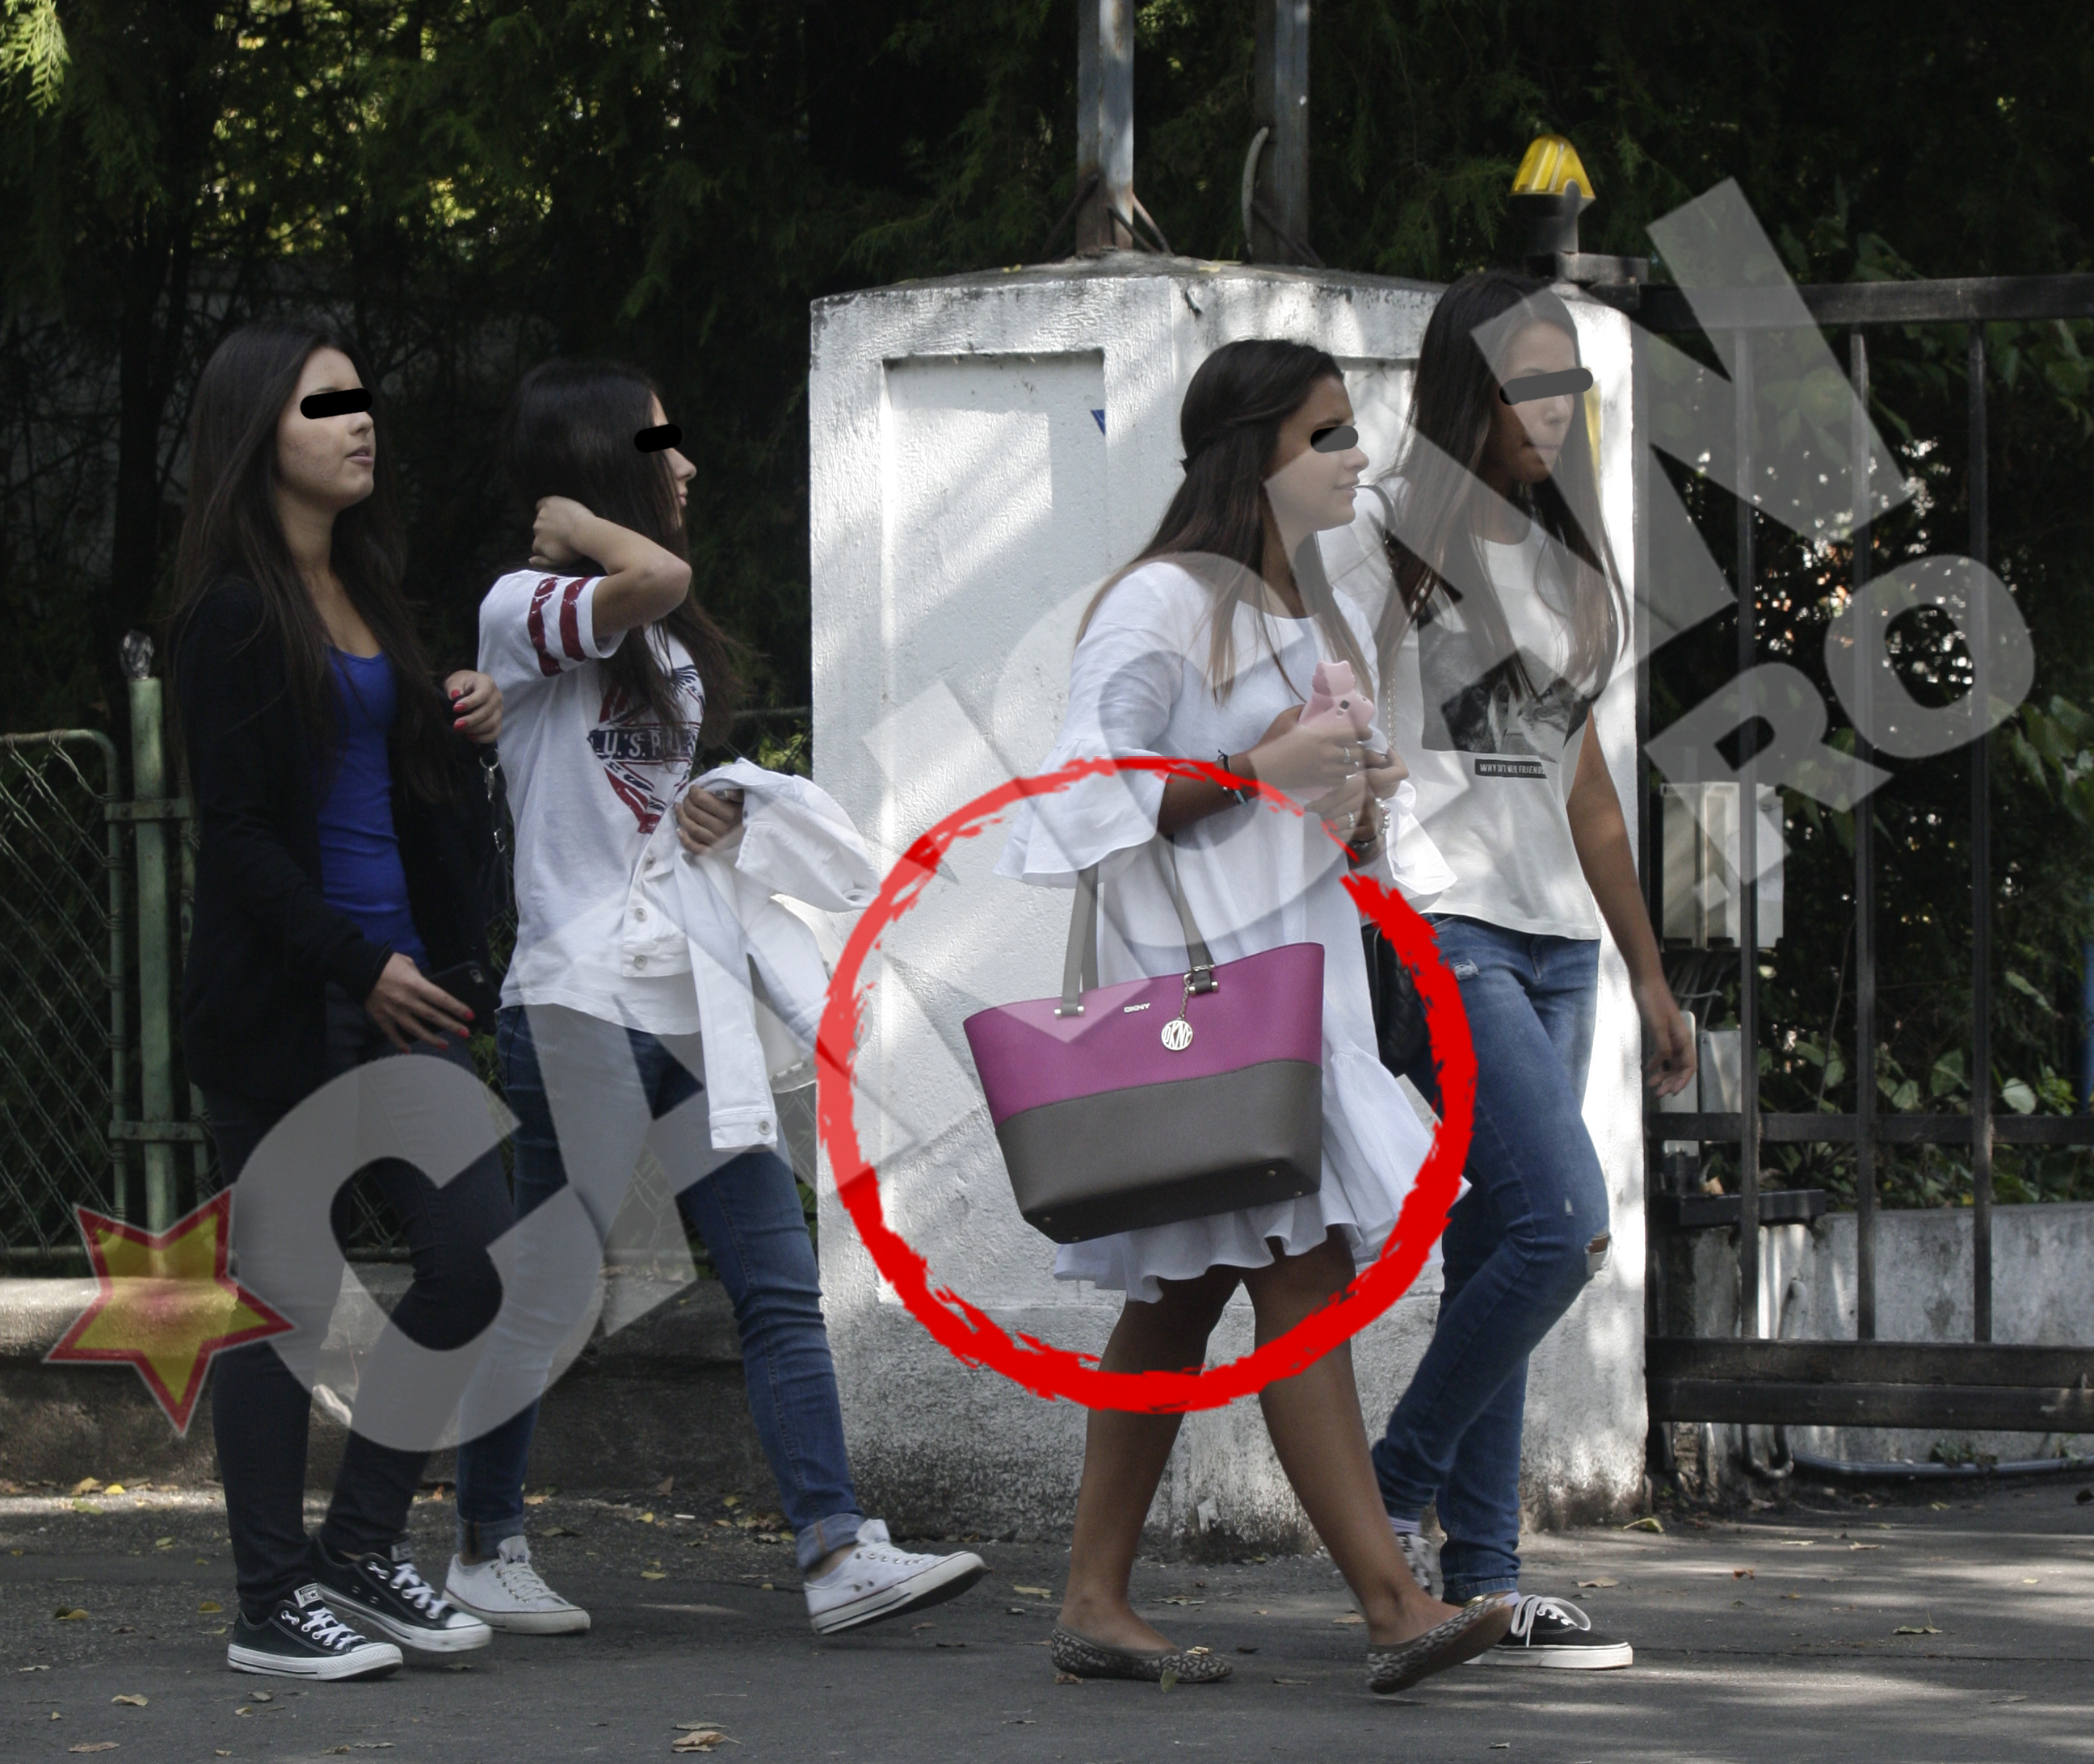 O eleva si-a bagat rechizitele intr-o geanta de cateva sute de euro